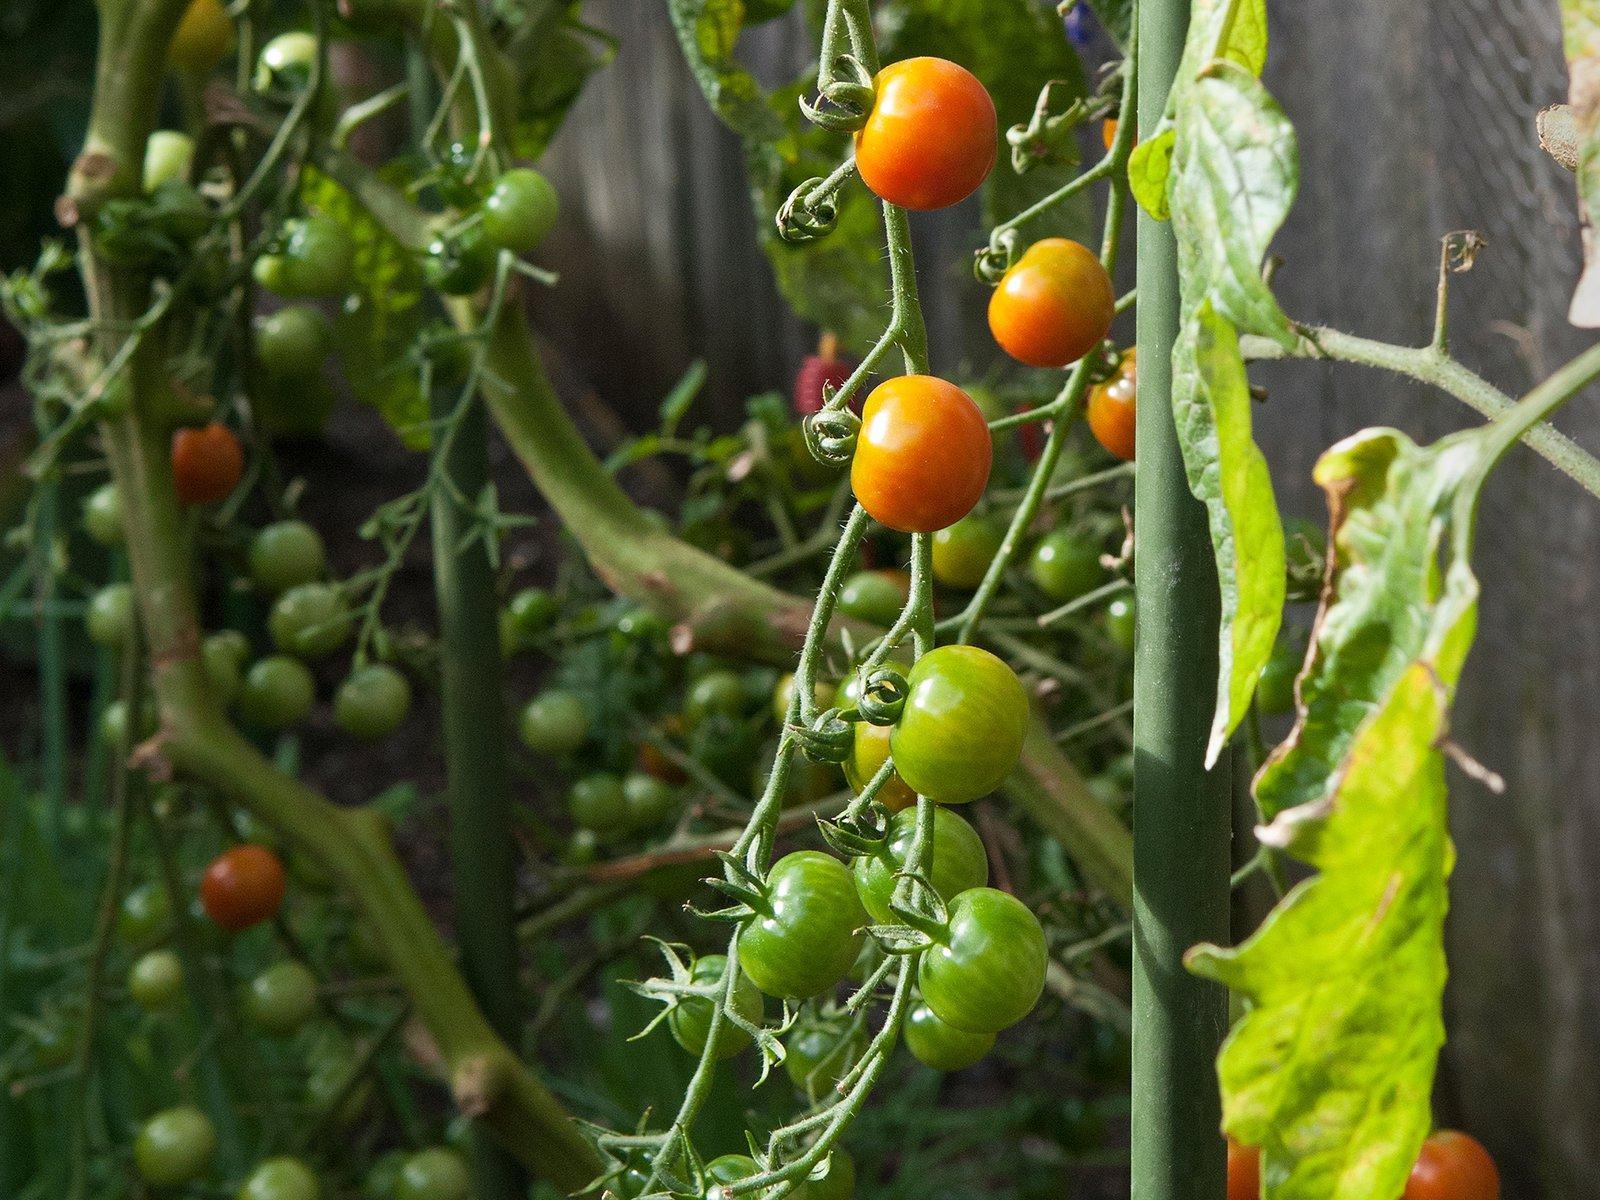 tomato plants in a garden